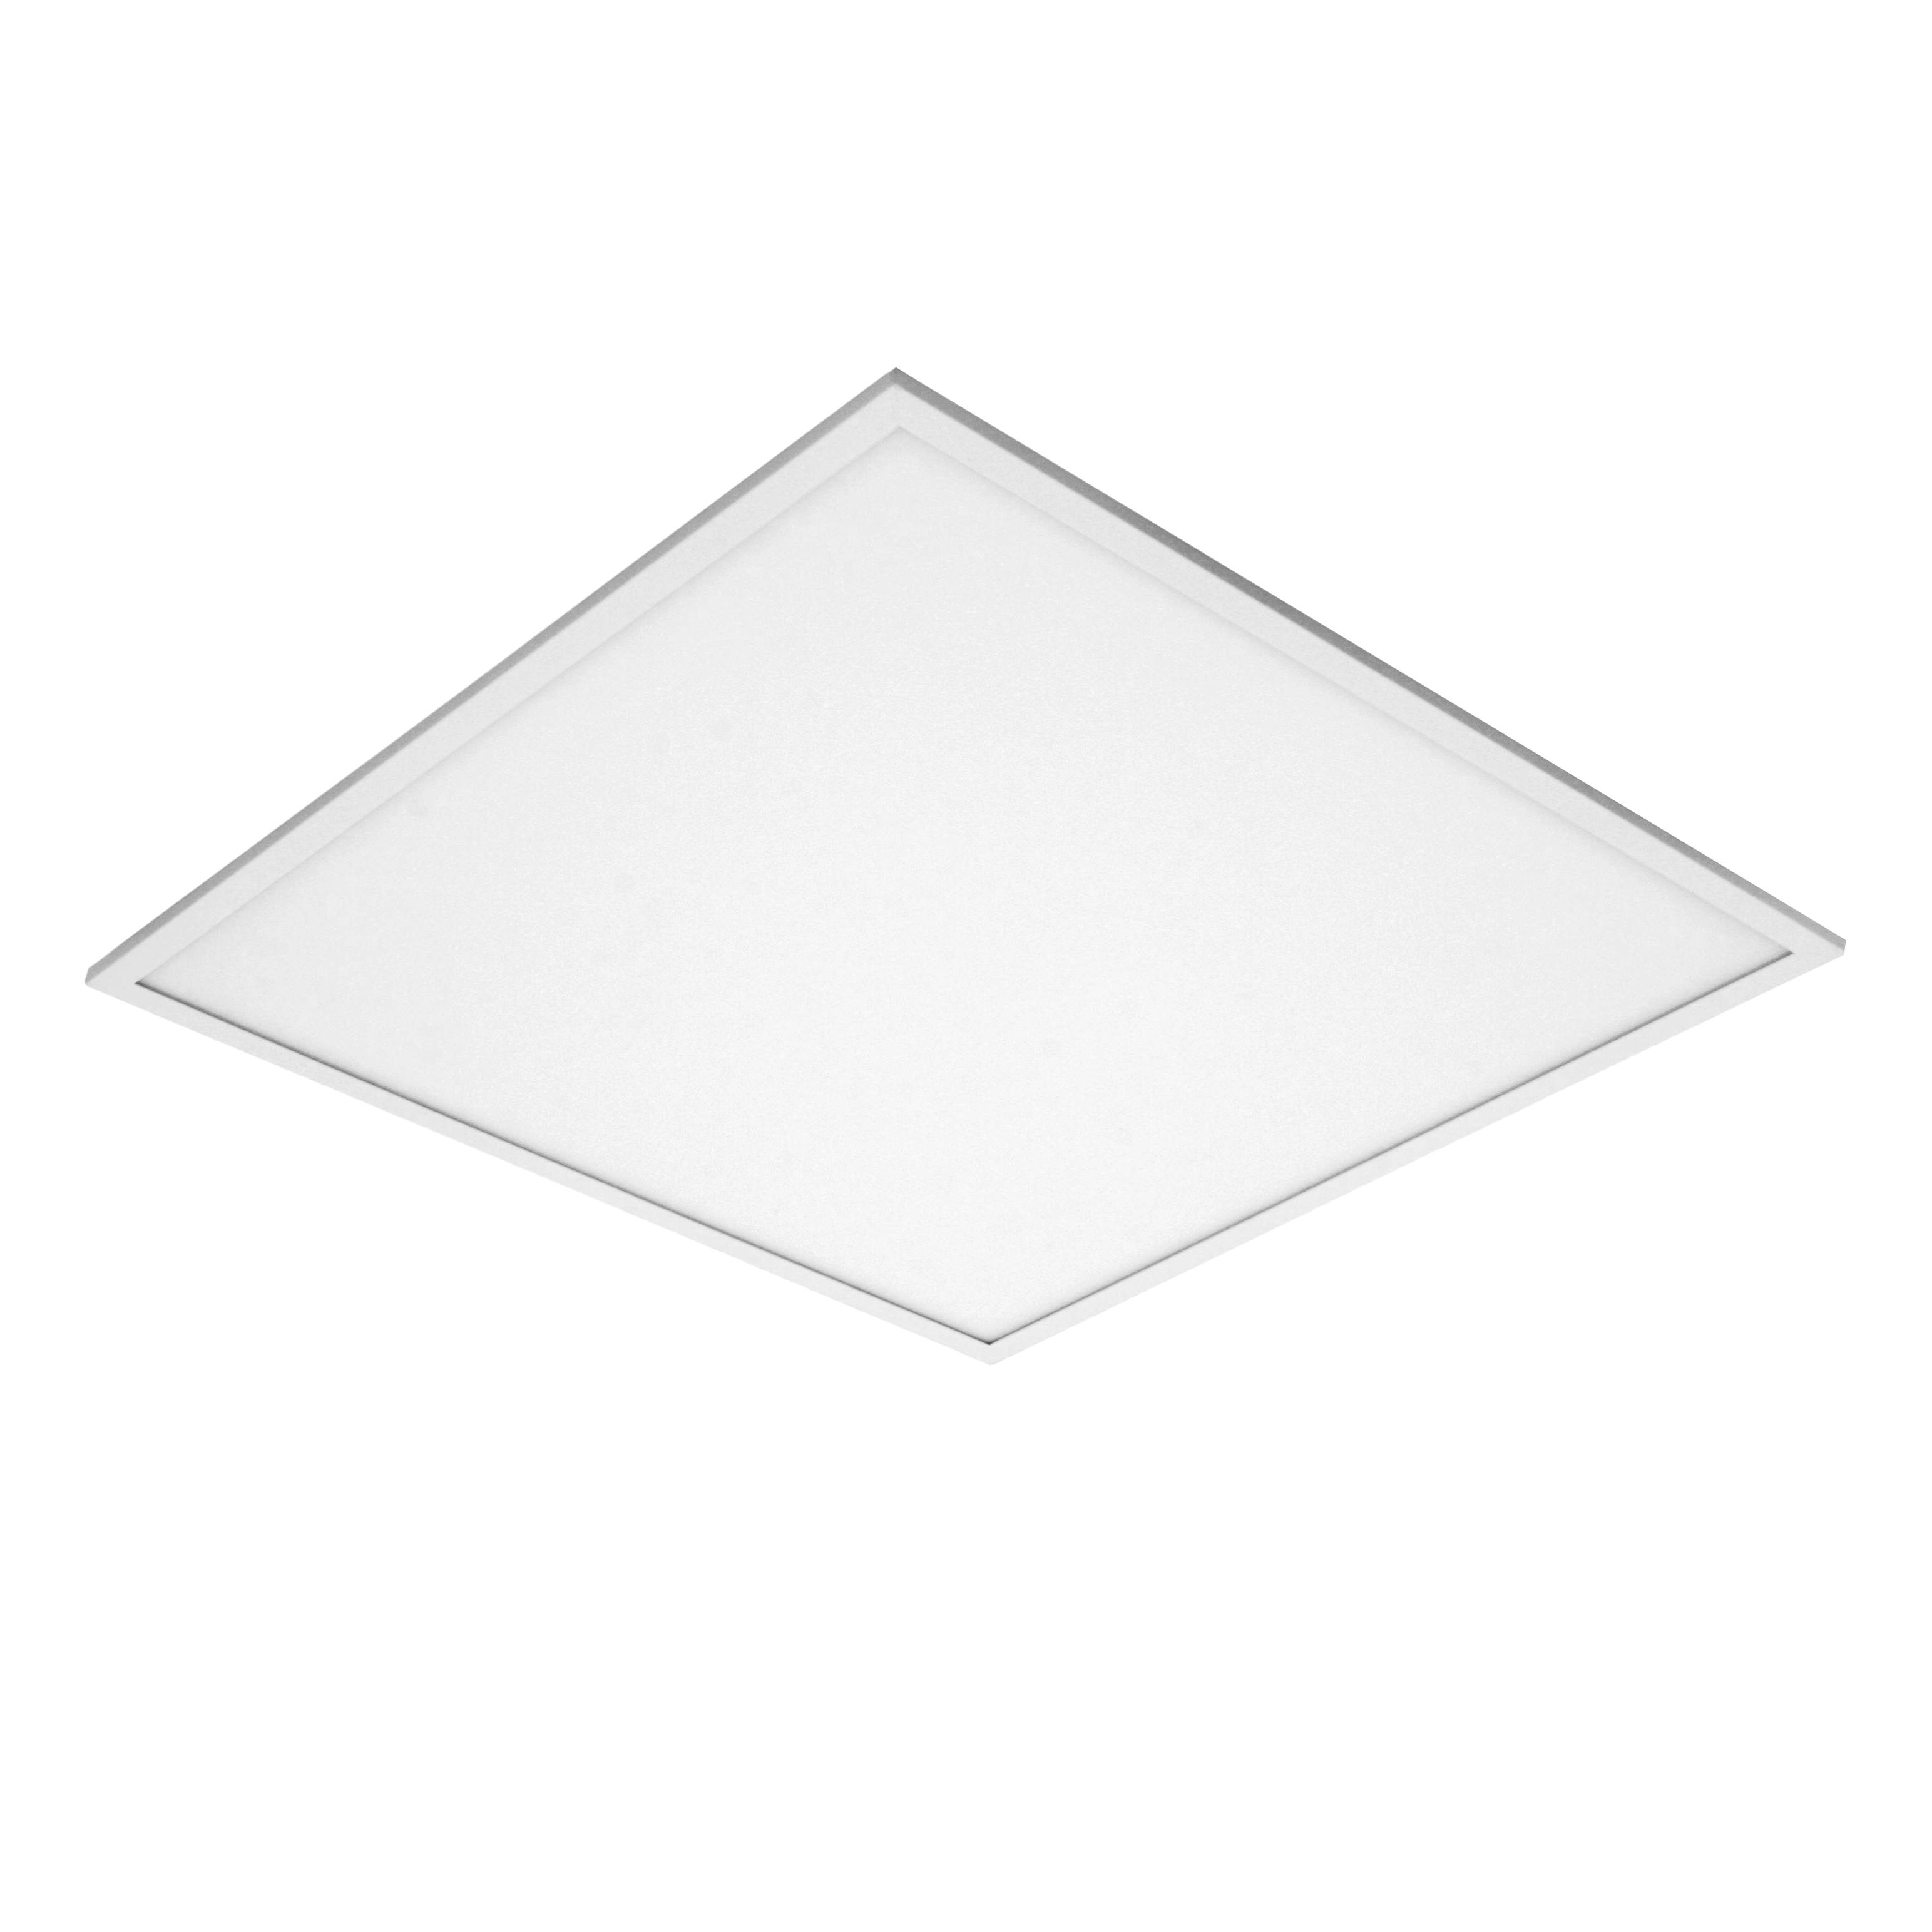 1 Stk LANO 3 LED 40W 4750lm, 840, UGR